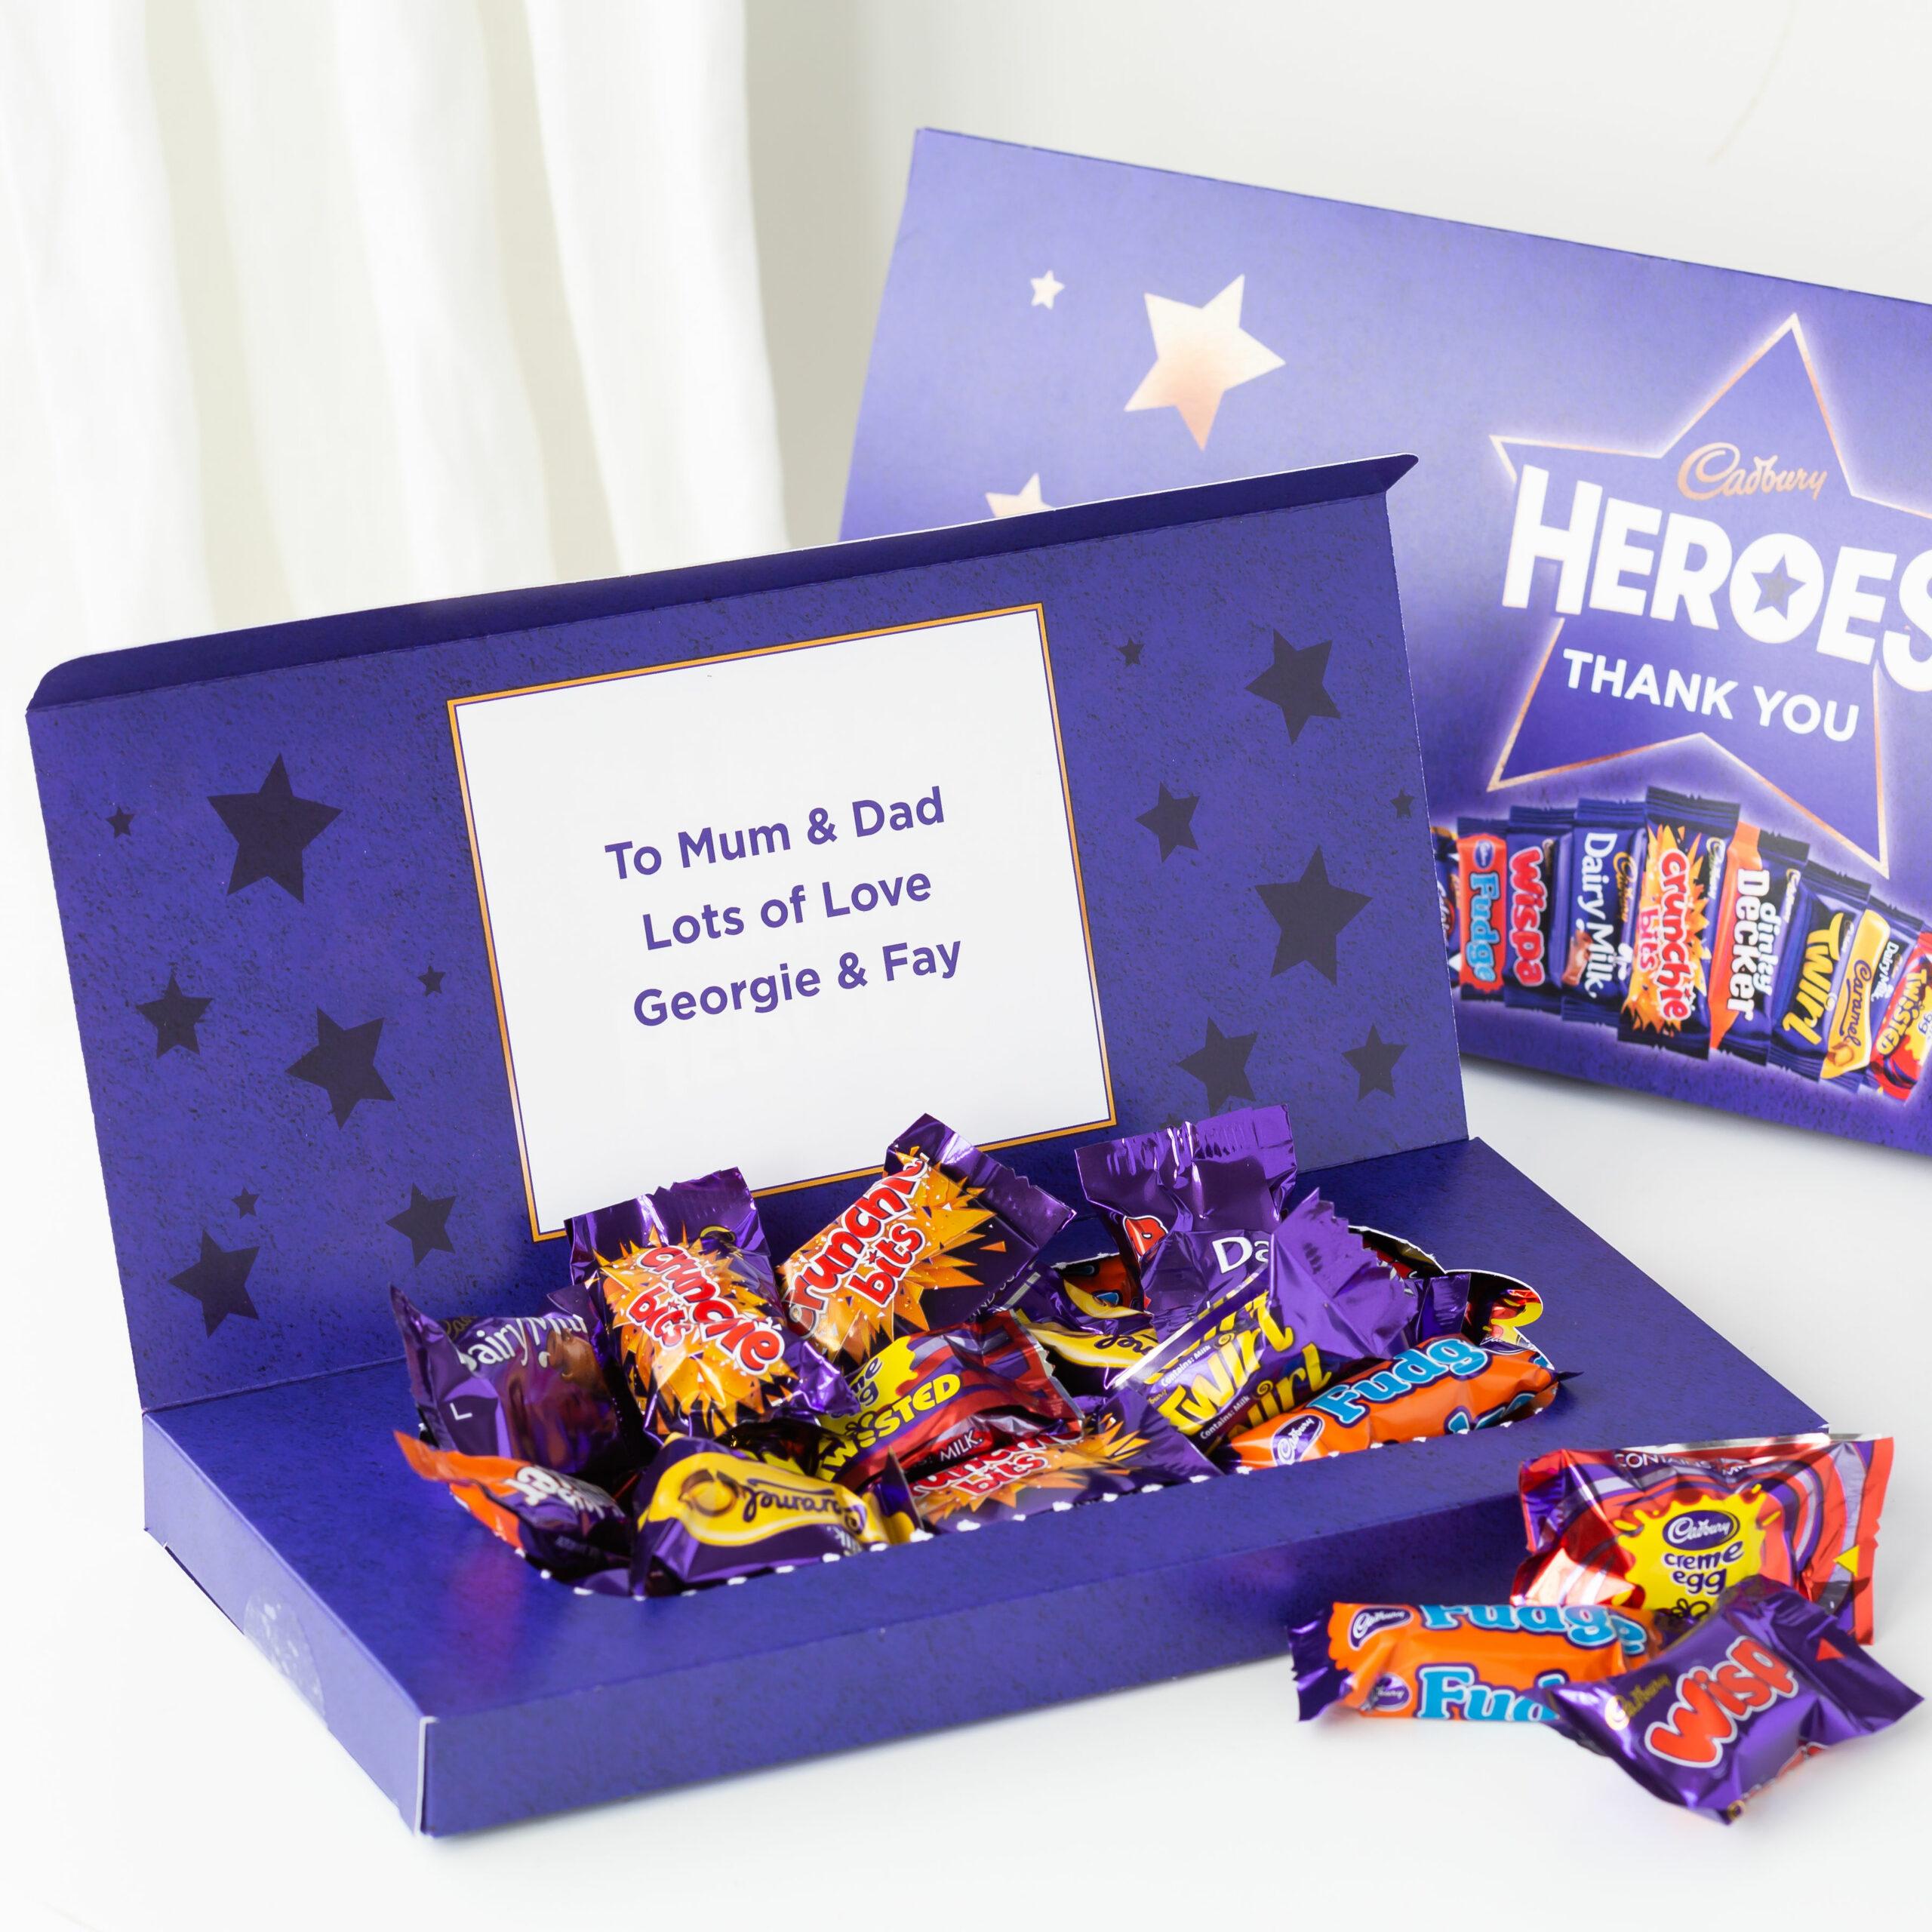 Personalised Cadbury Chocolate Heroes Mailbox Selection 290g (Copy)